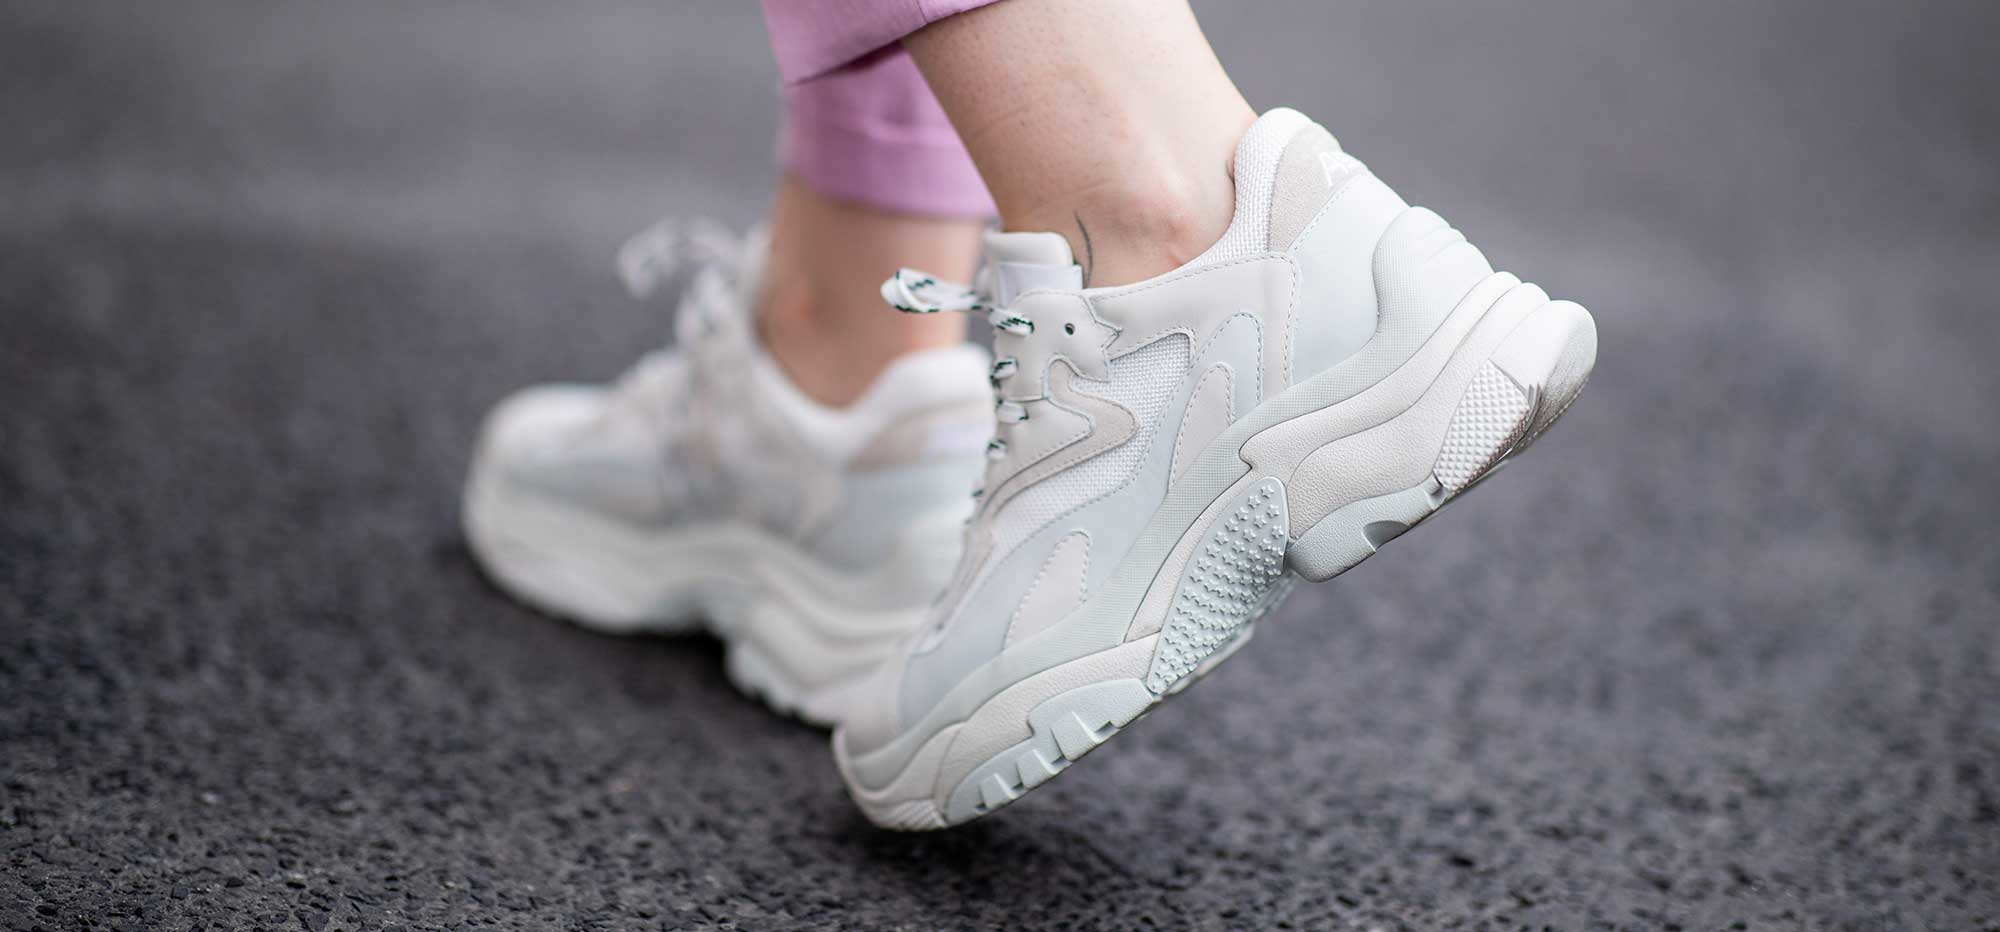 sneakers - Sneaker Culture